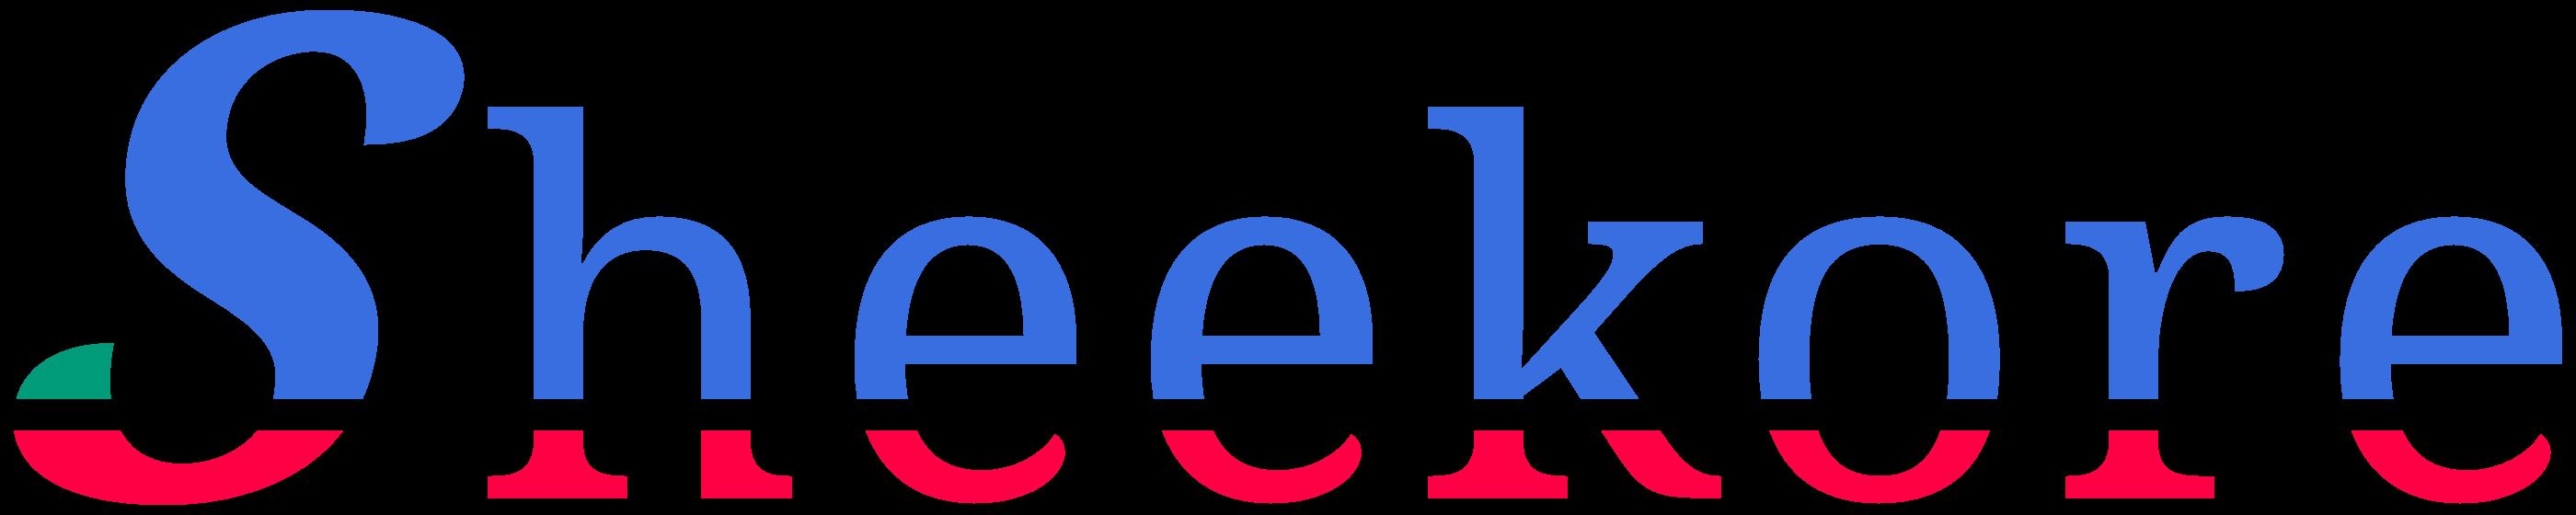 Sheekore full colored logo.